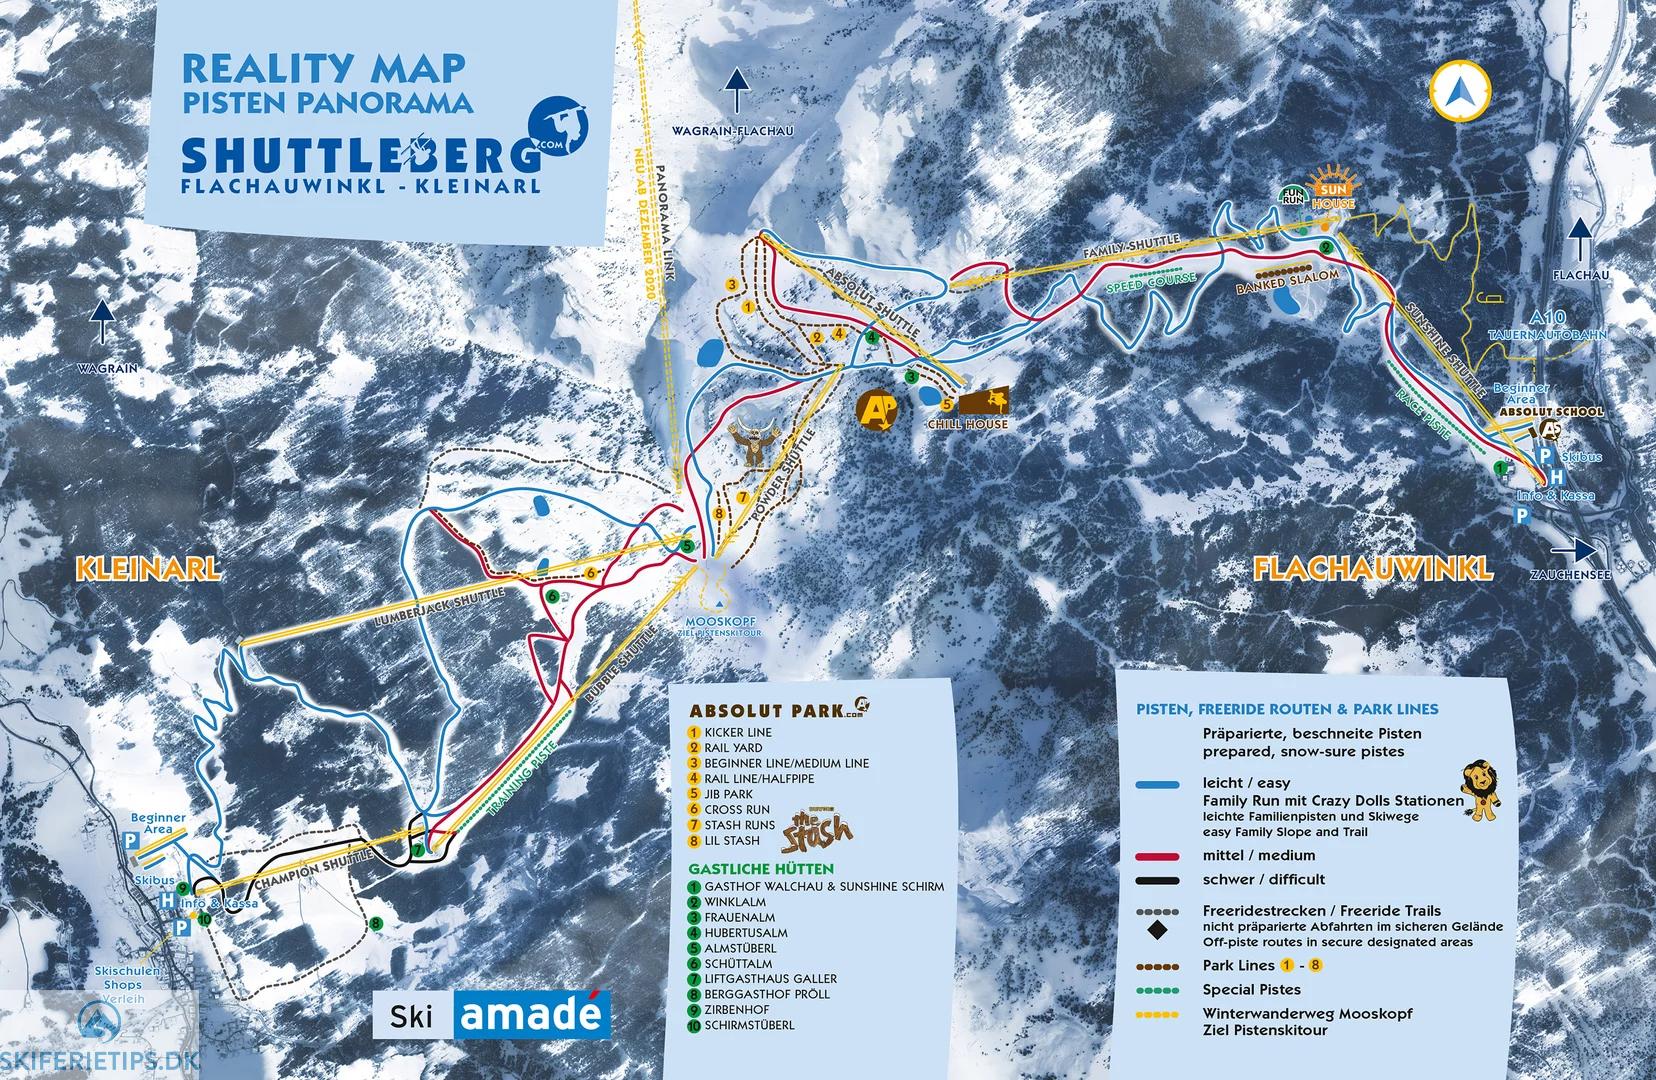 Kleinarl Pistekort Se Kort Over Pister Og Skilifter